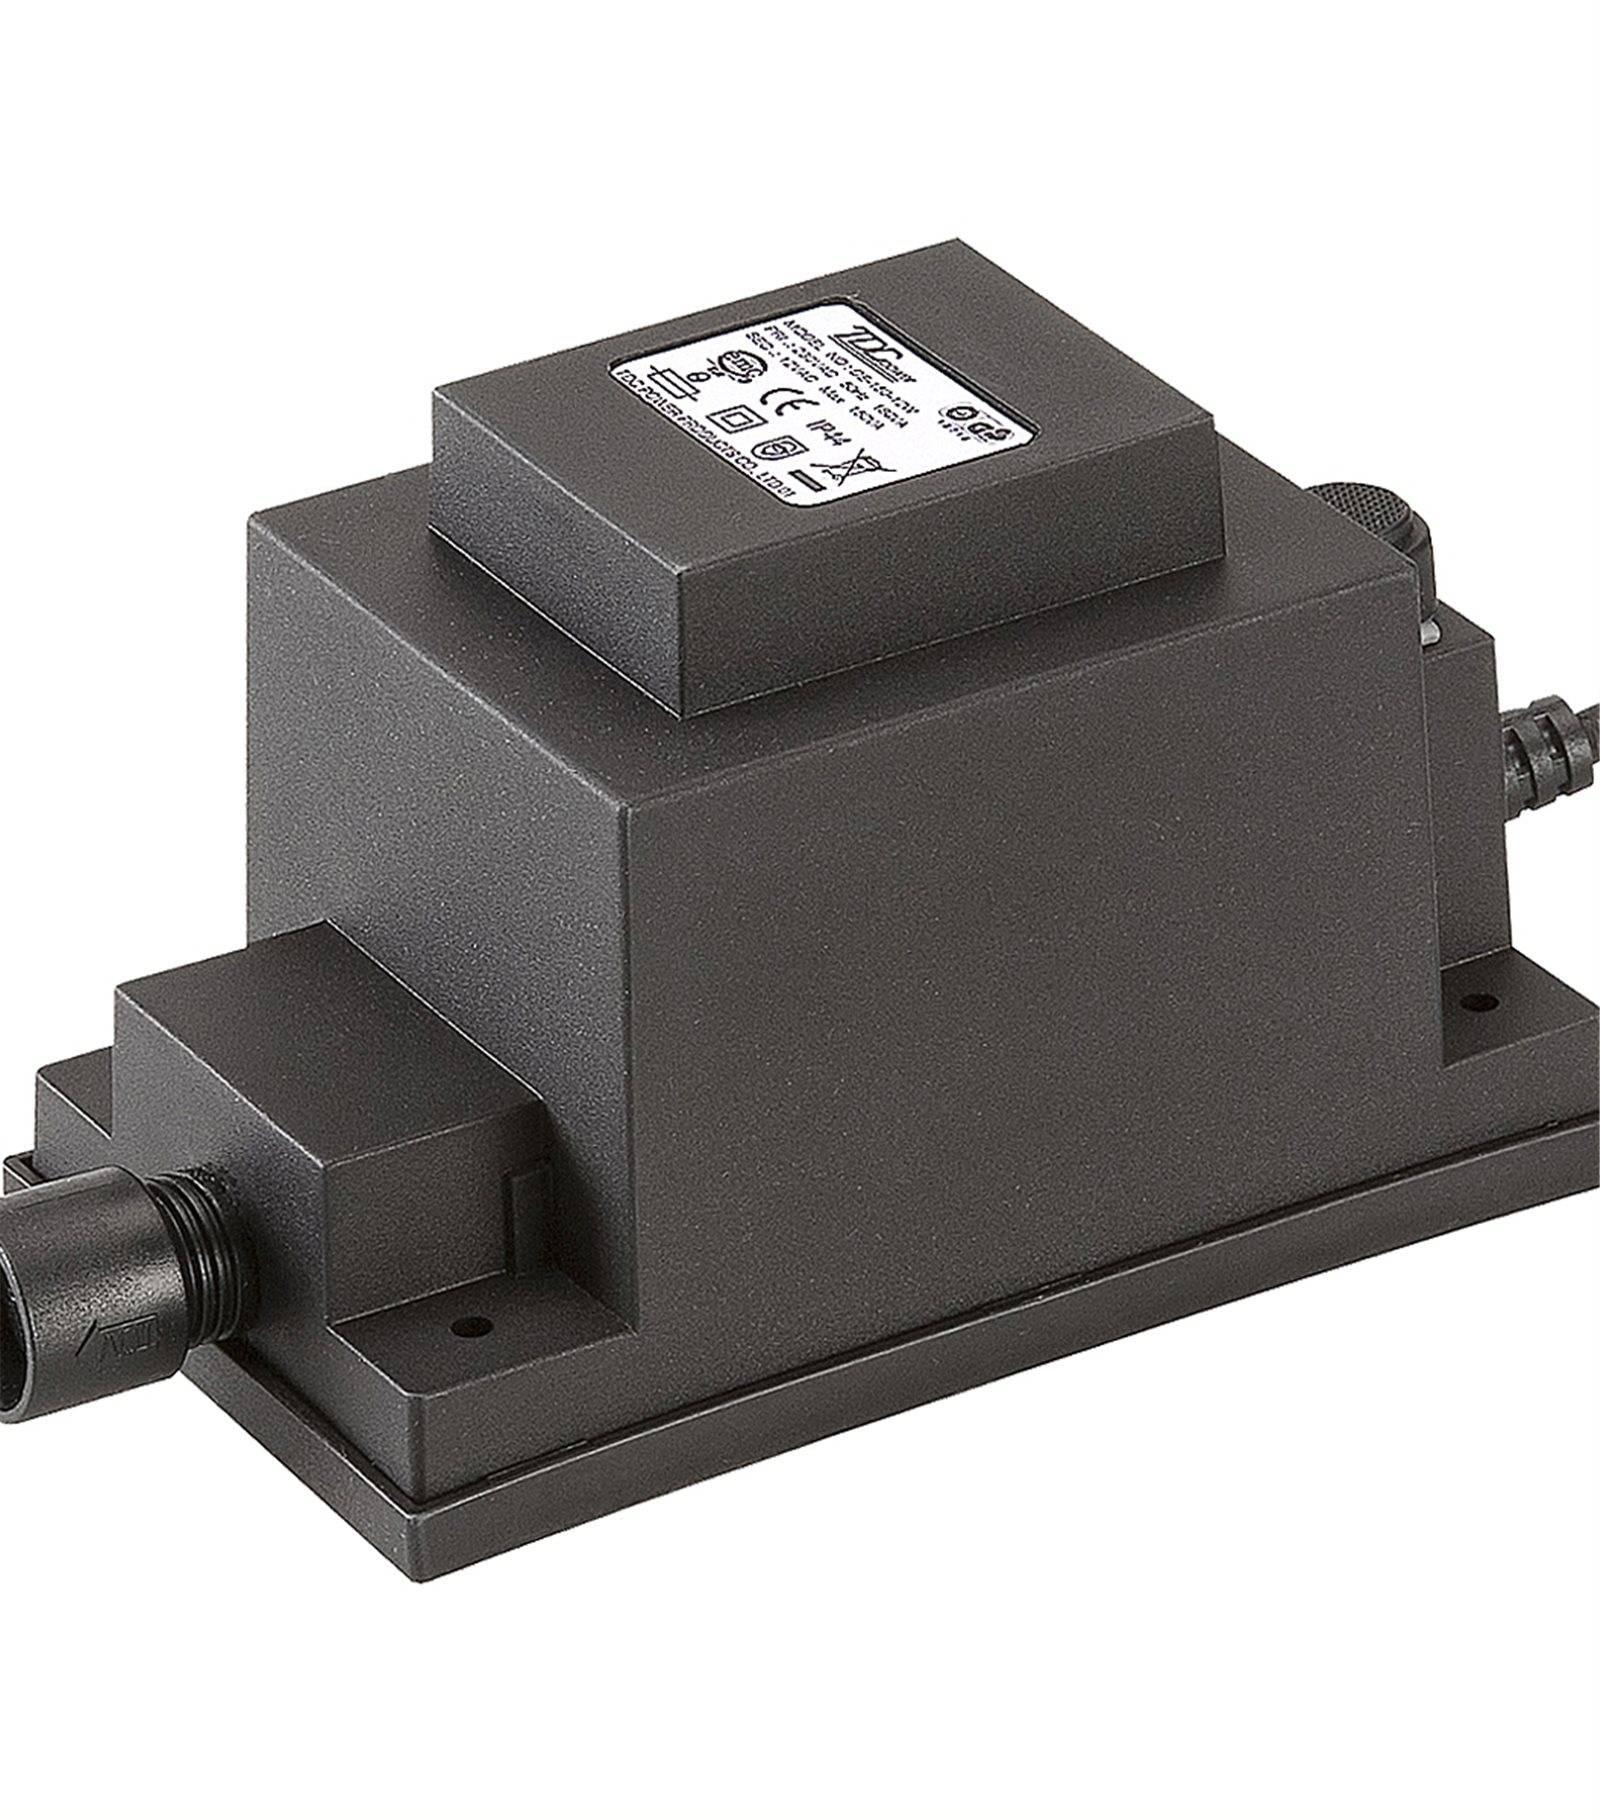 Garden Lights Transformateur IP44 12v 150W Garden lights - GL6211011